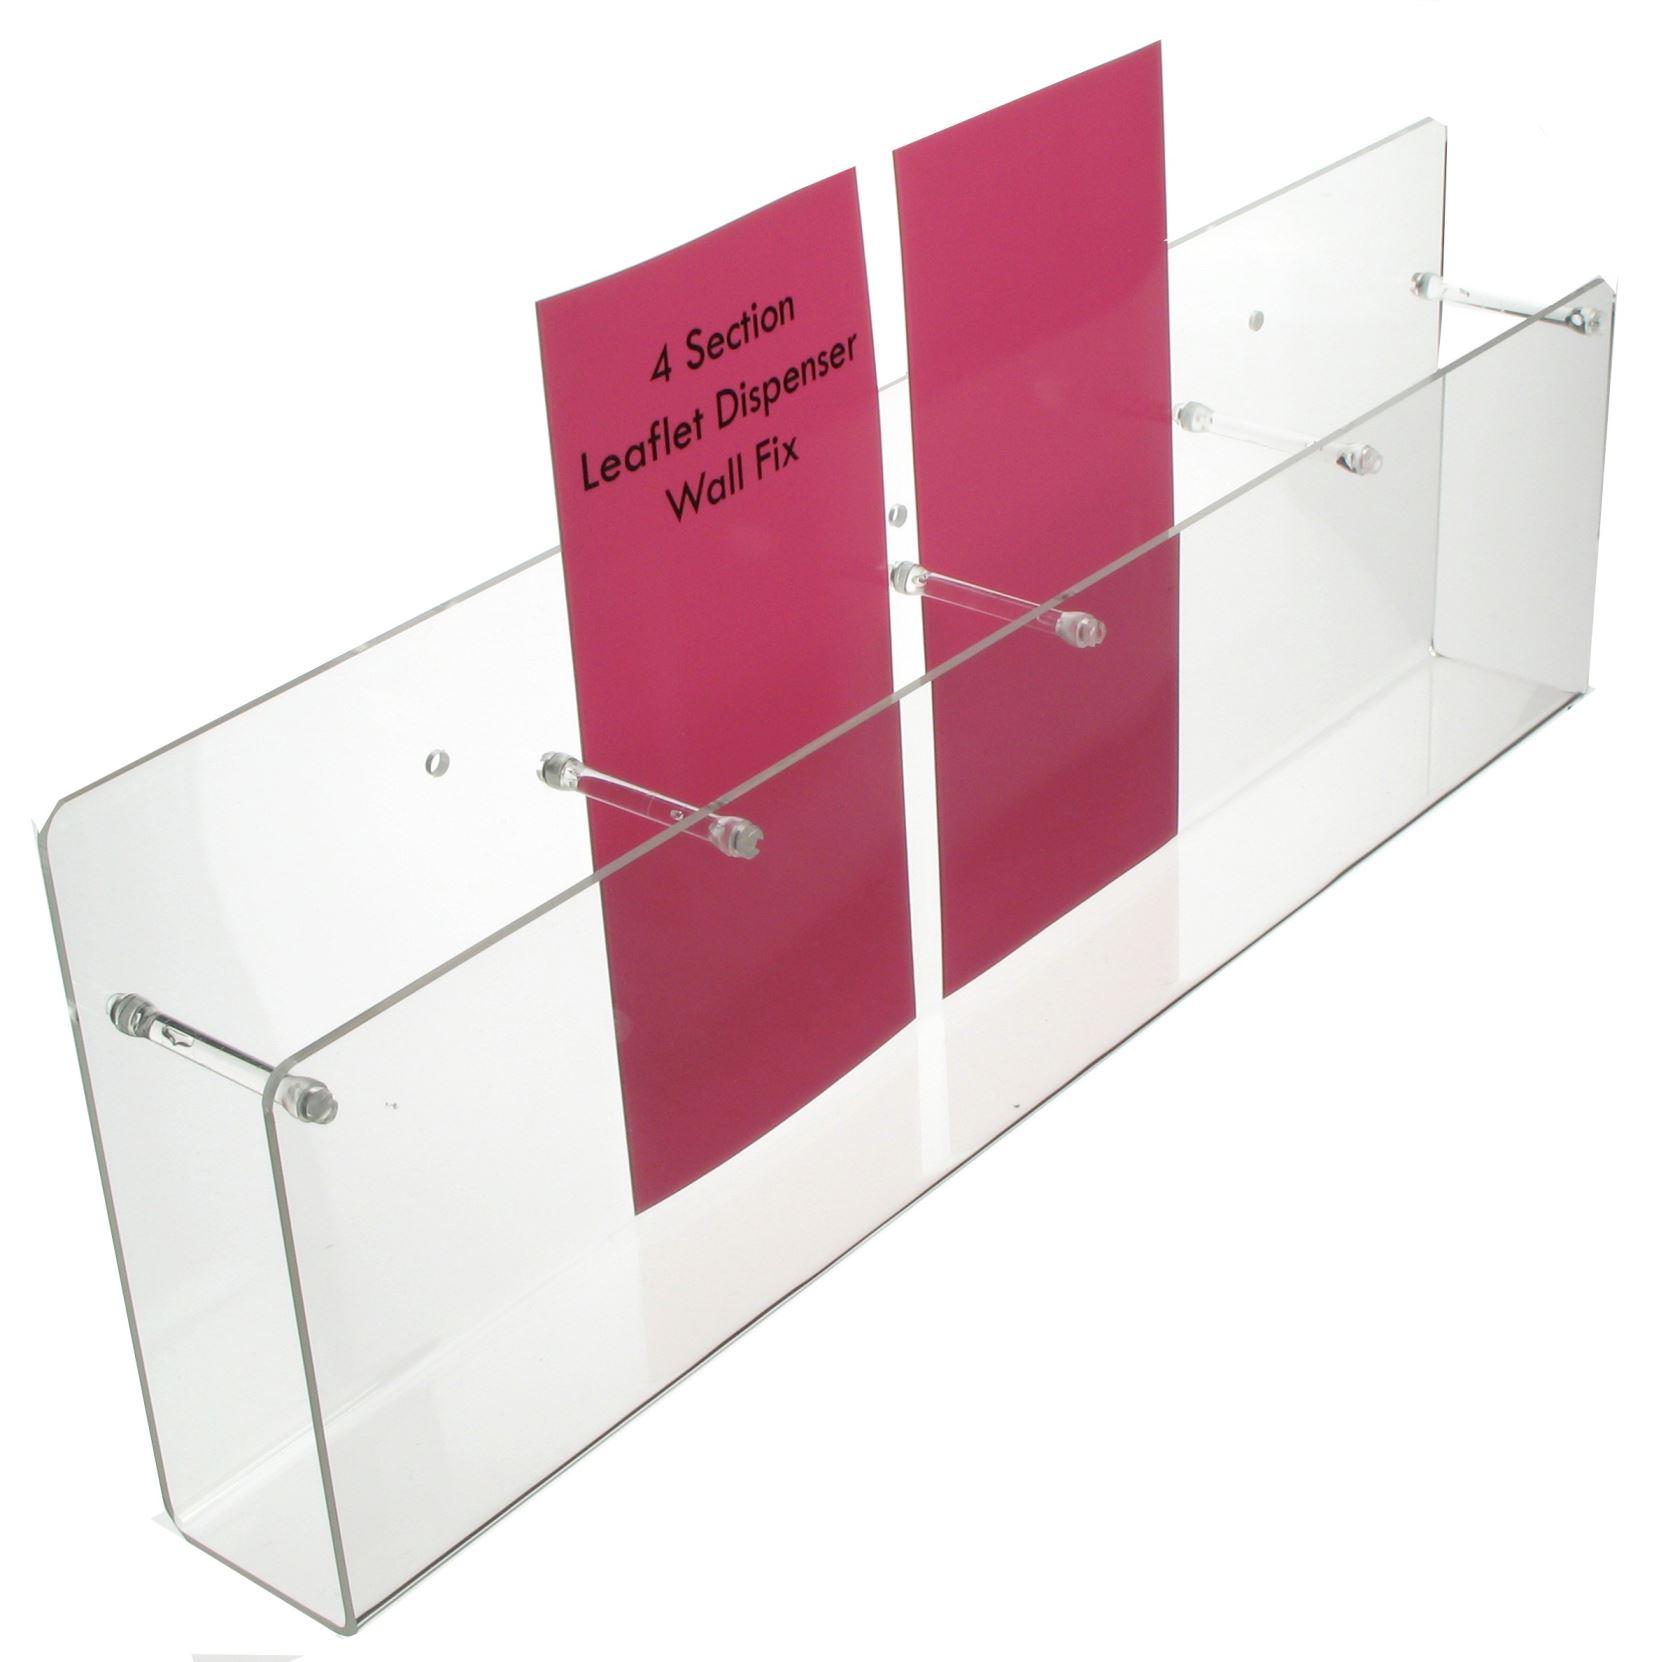 4 Section Leaflet Dispenser - Wall Fix